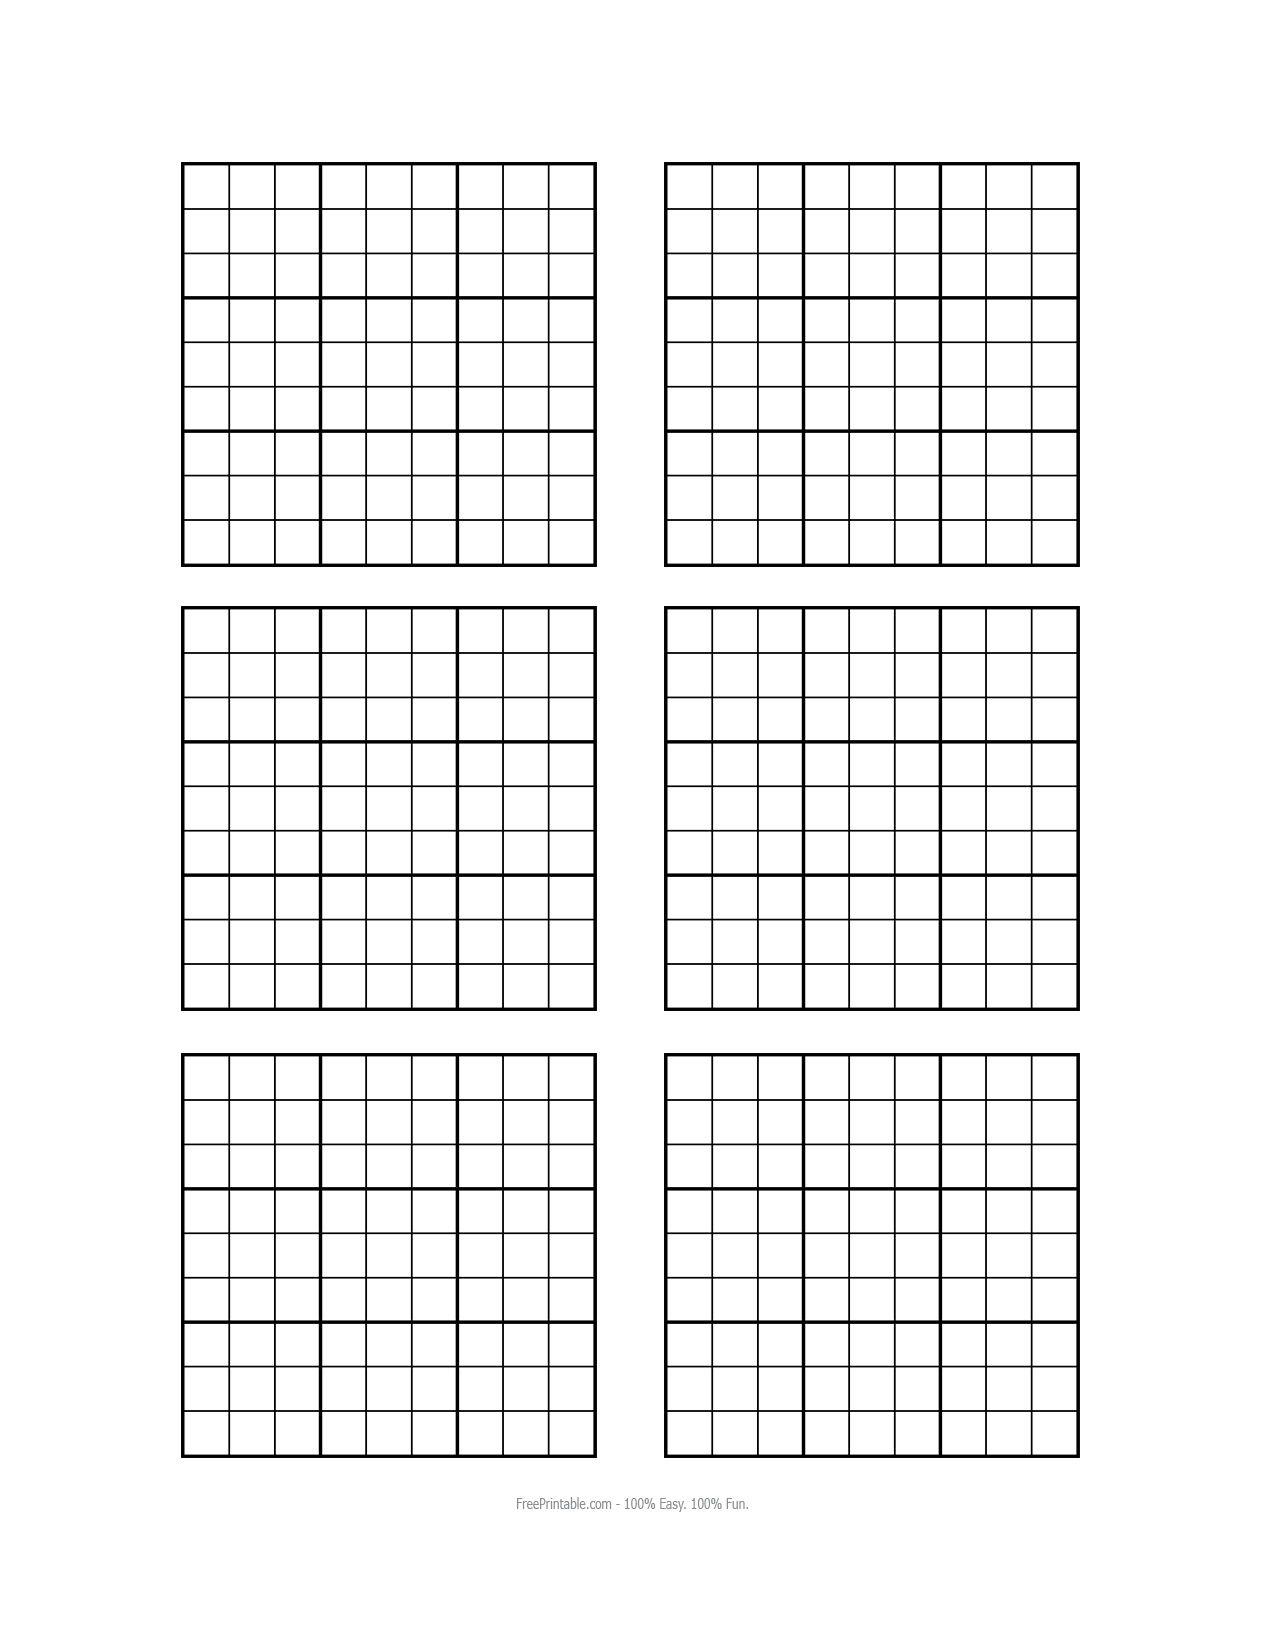 Sudoku Blank Grids Printable Free